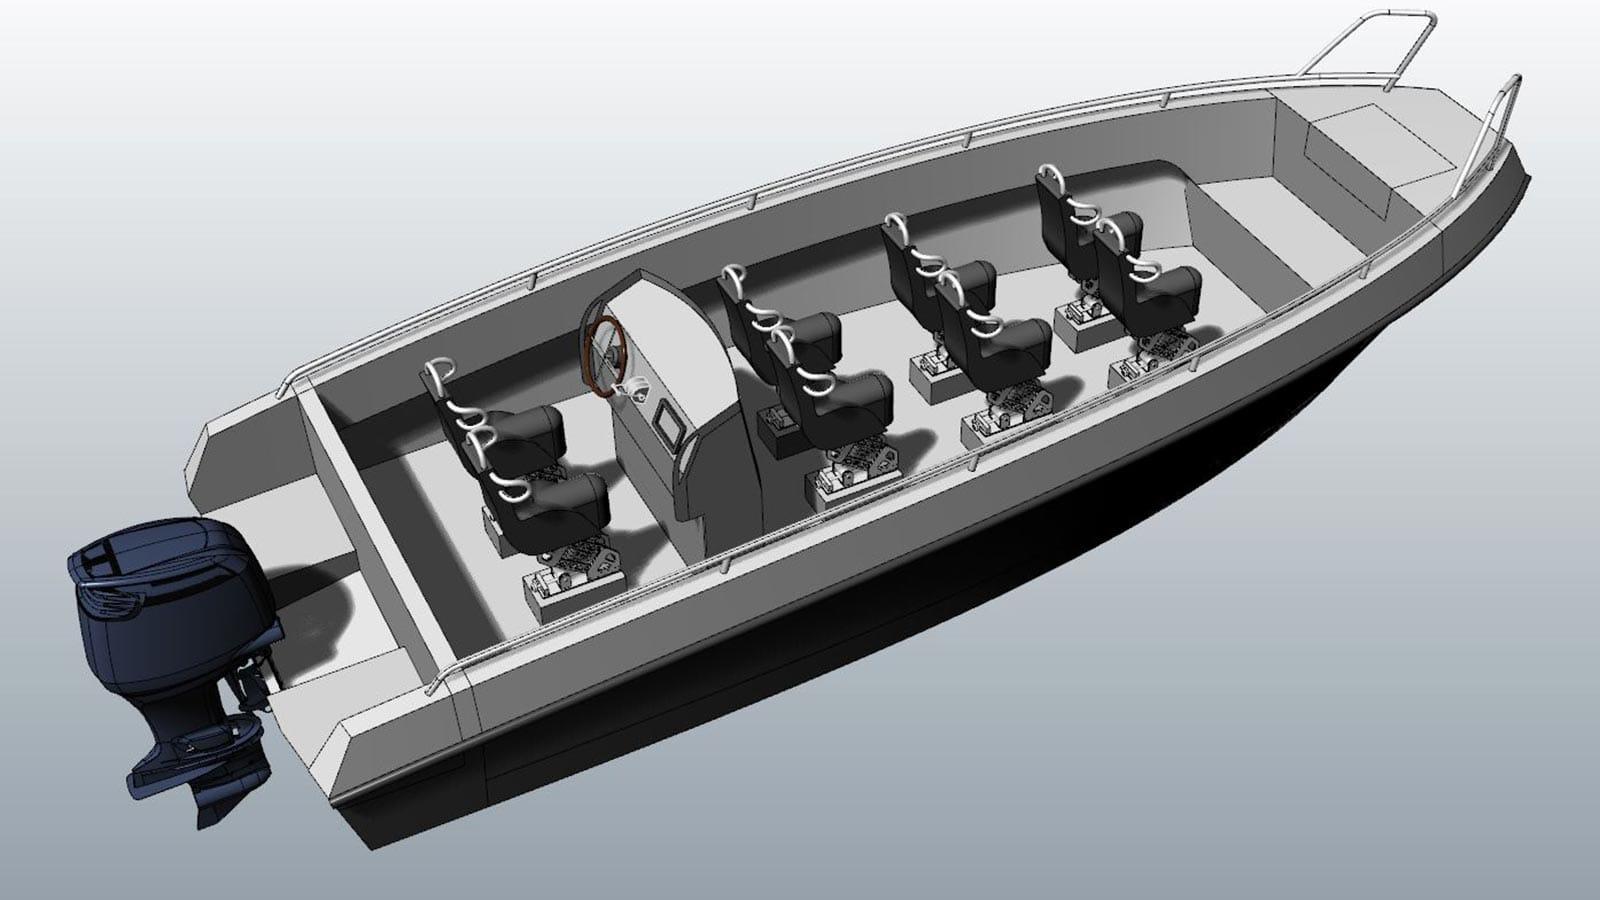 AluminiumJon.nl - BS 600 tender - Standaard & Heavy Duty - Aluminium boten